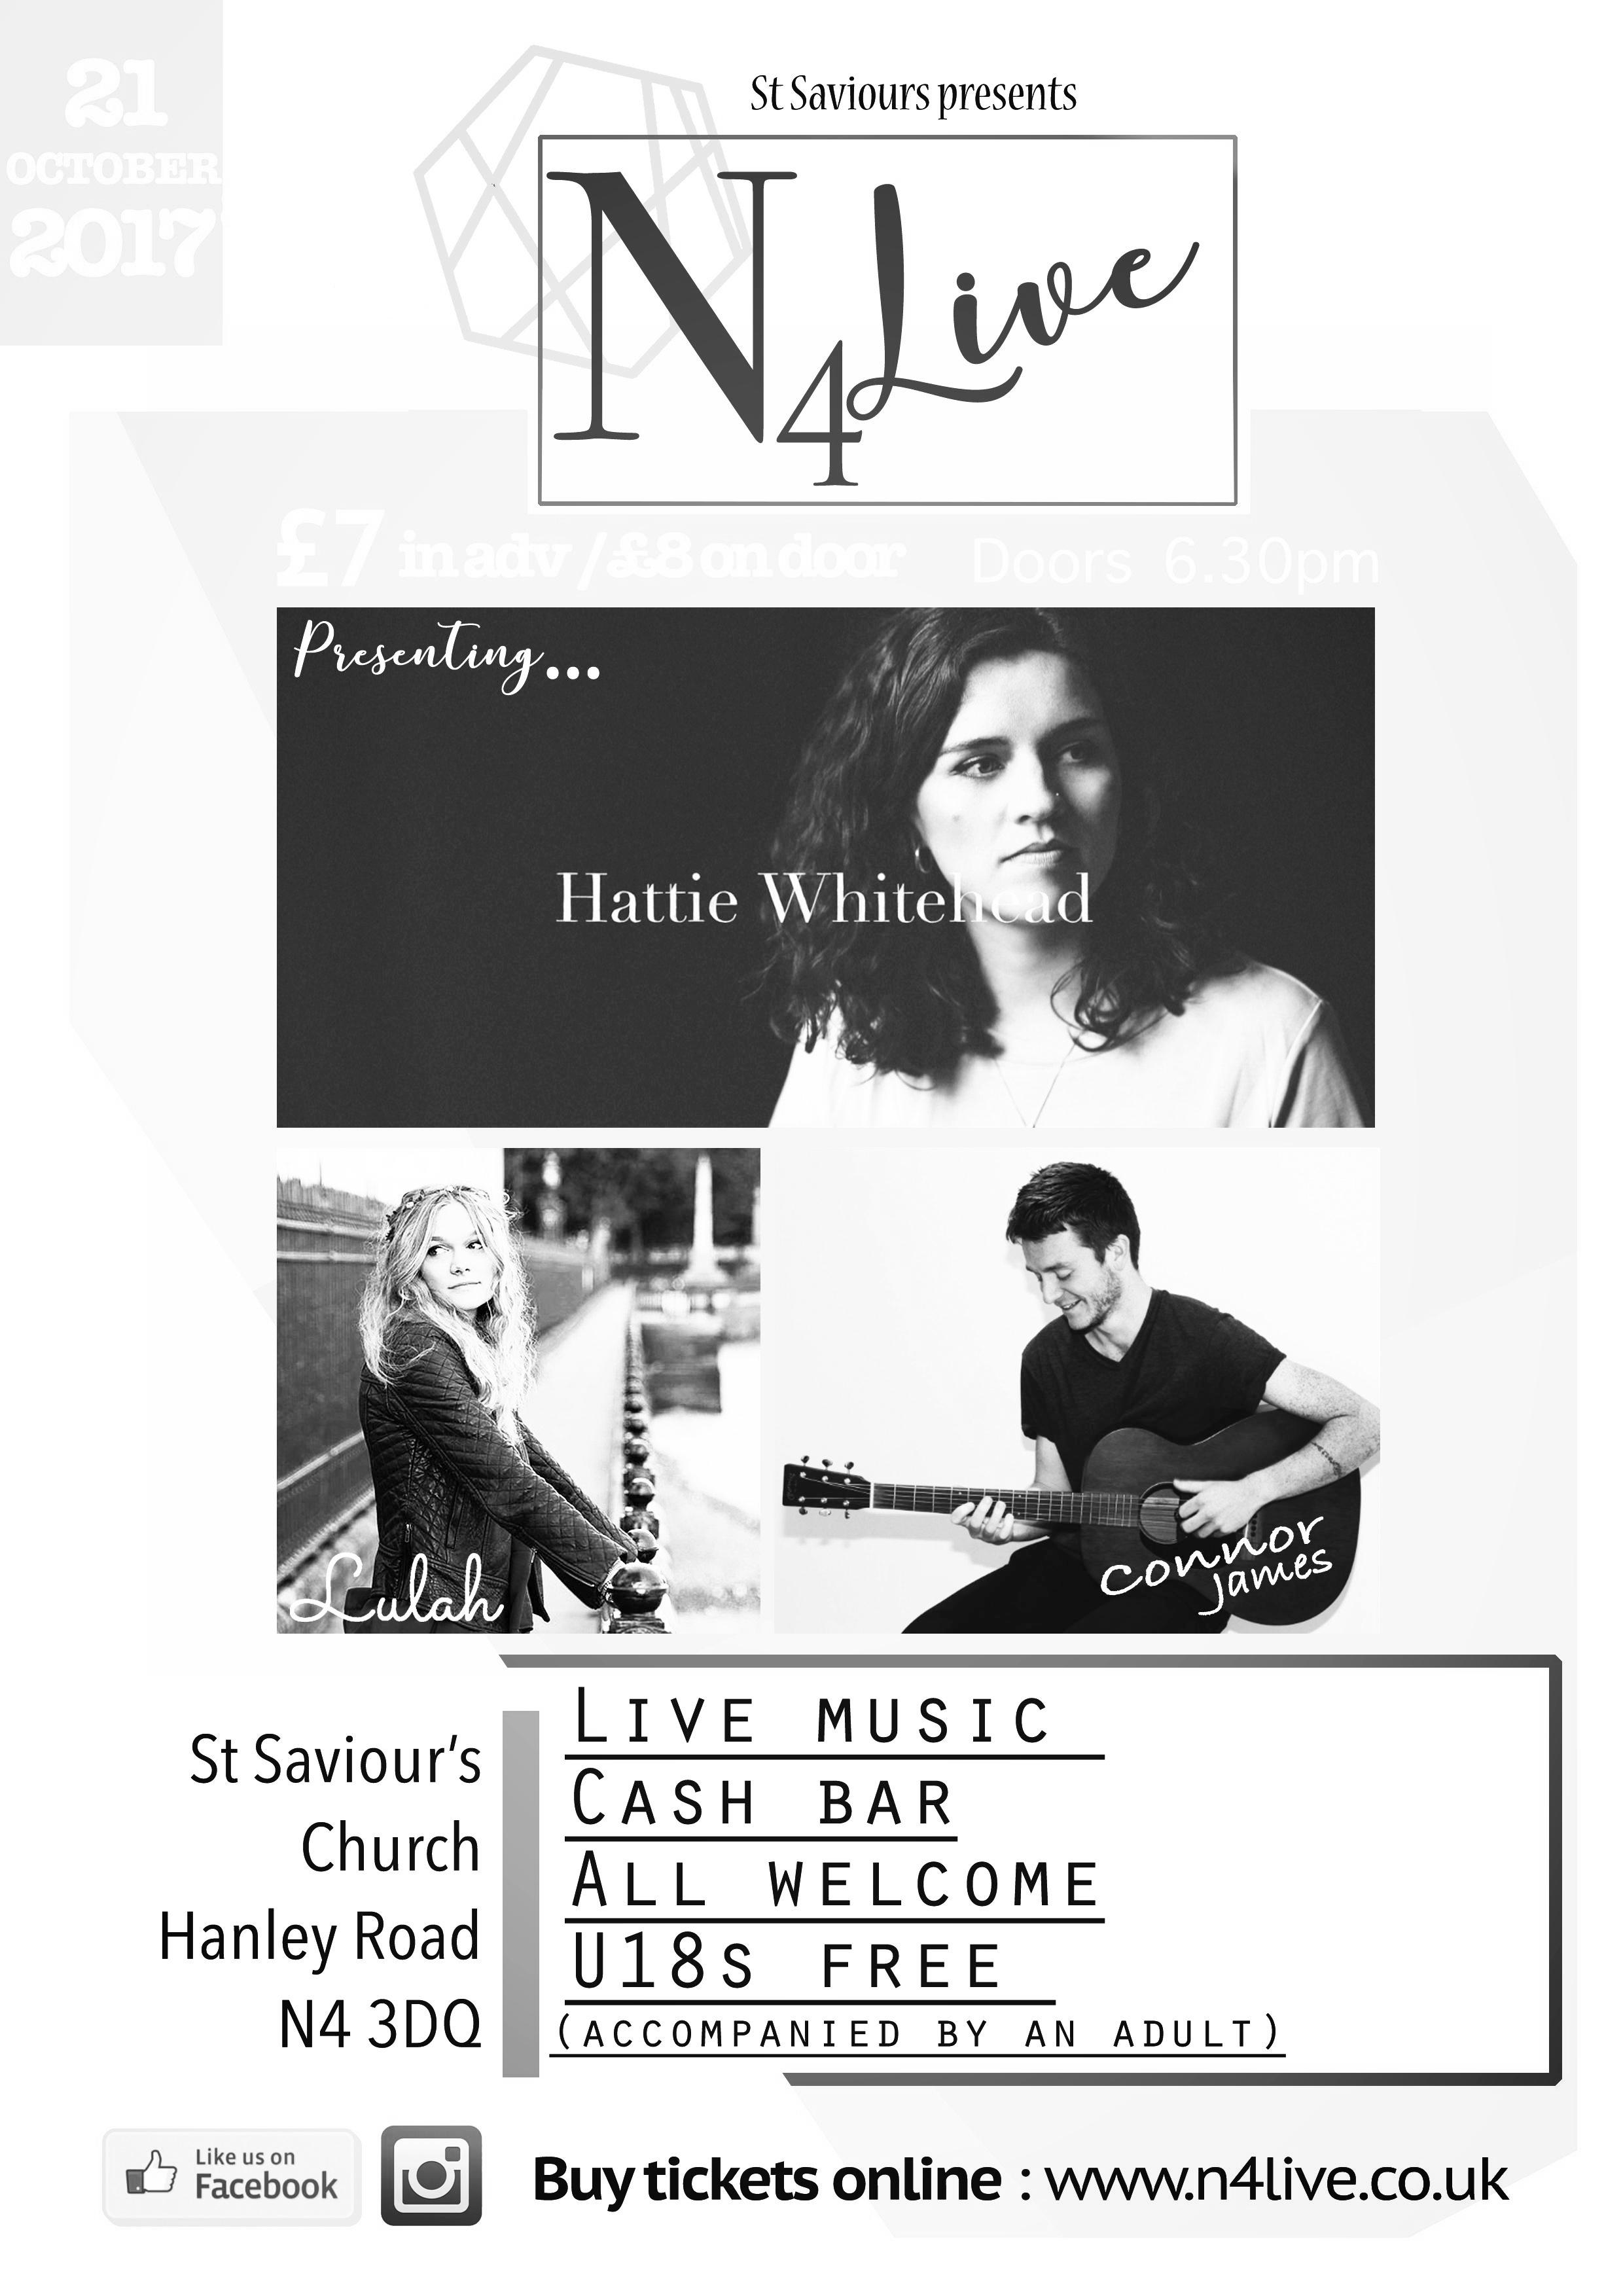 N4 live poster 2017.jpg